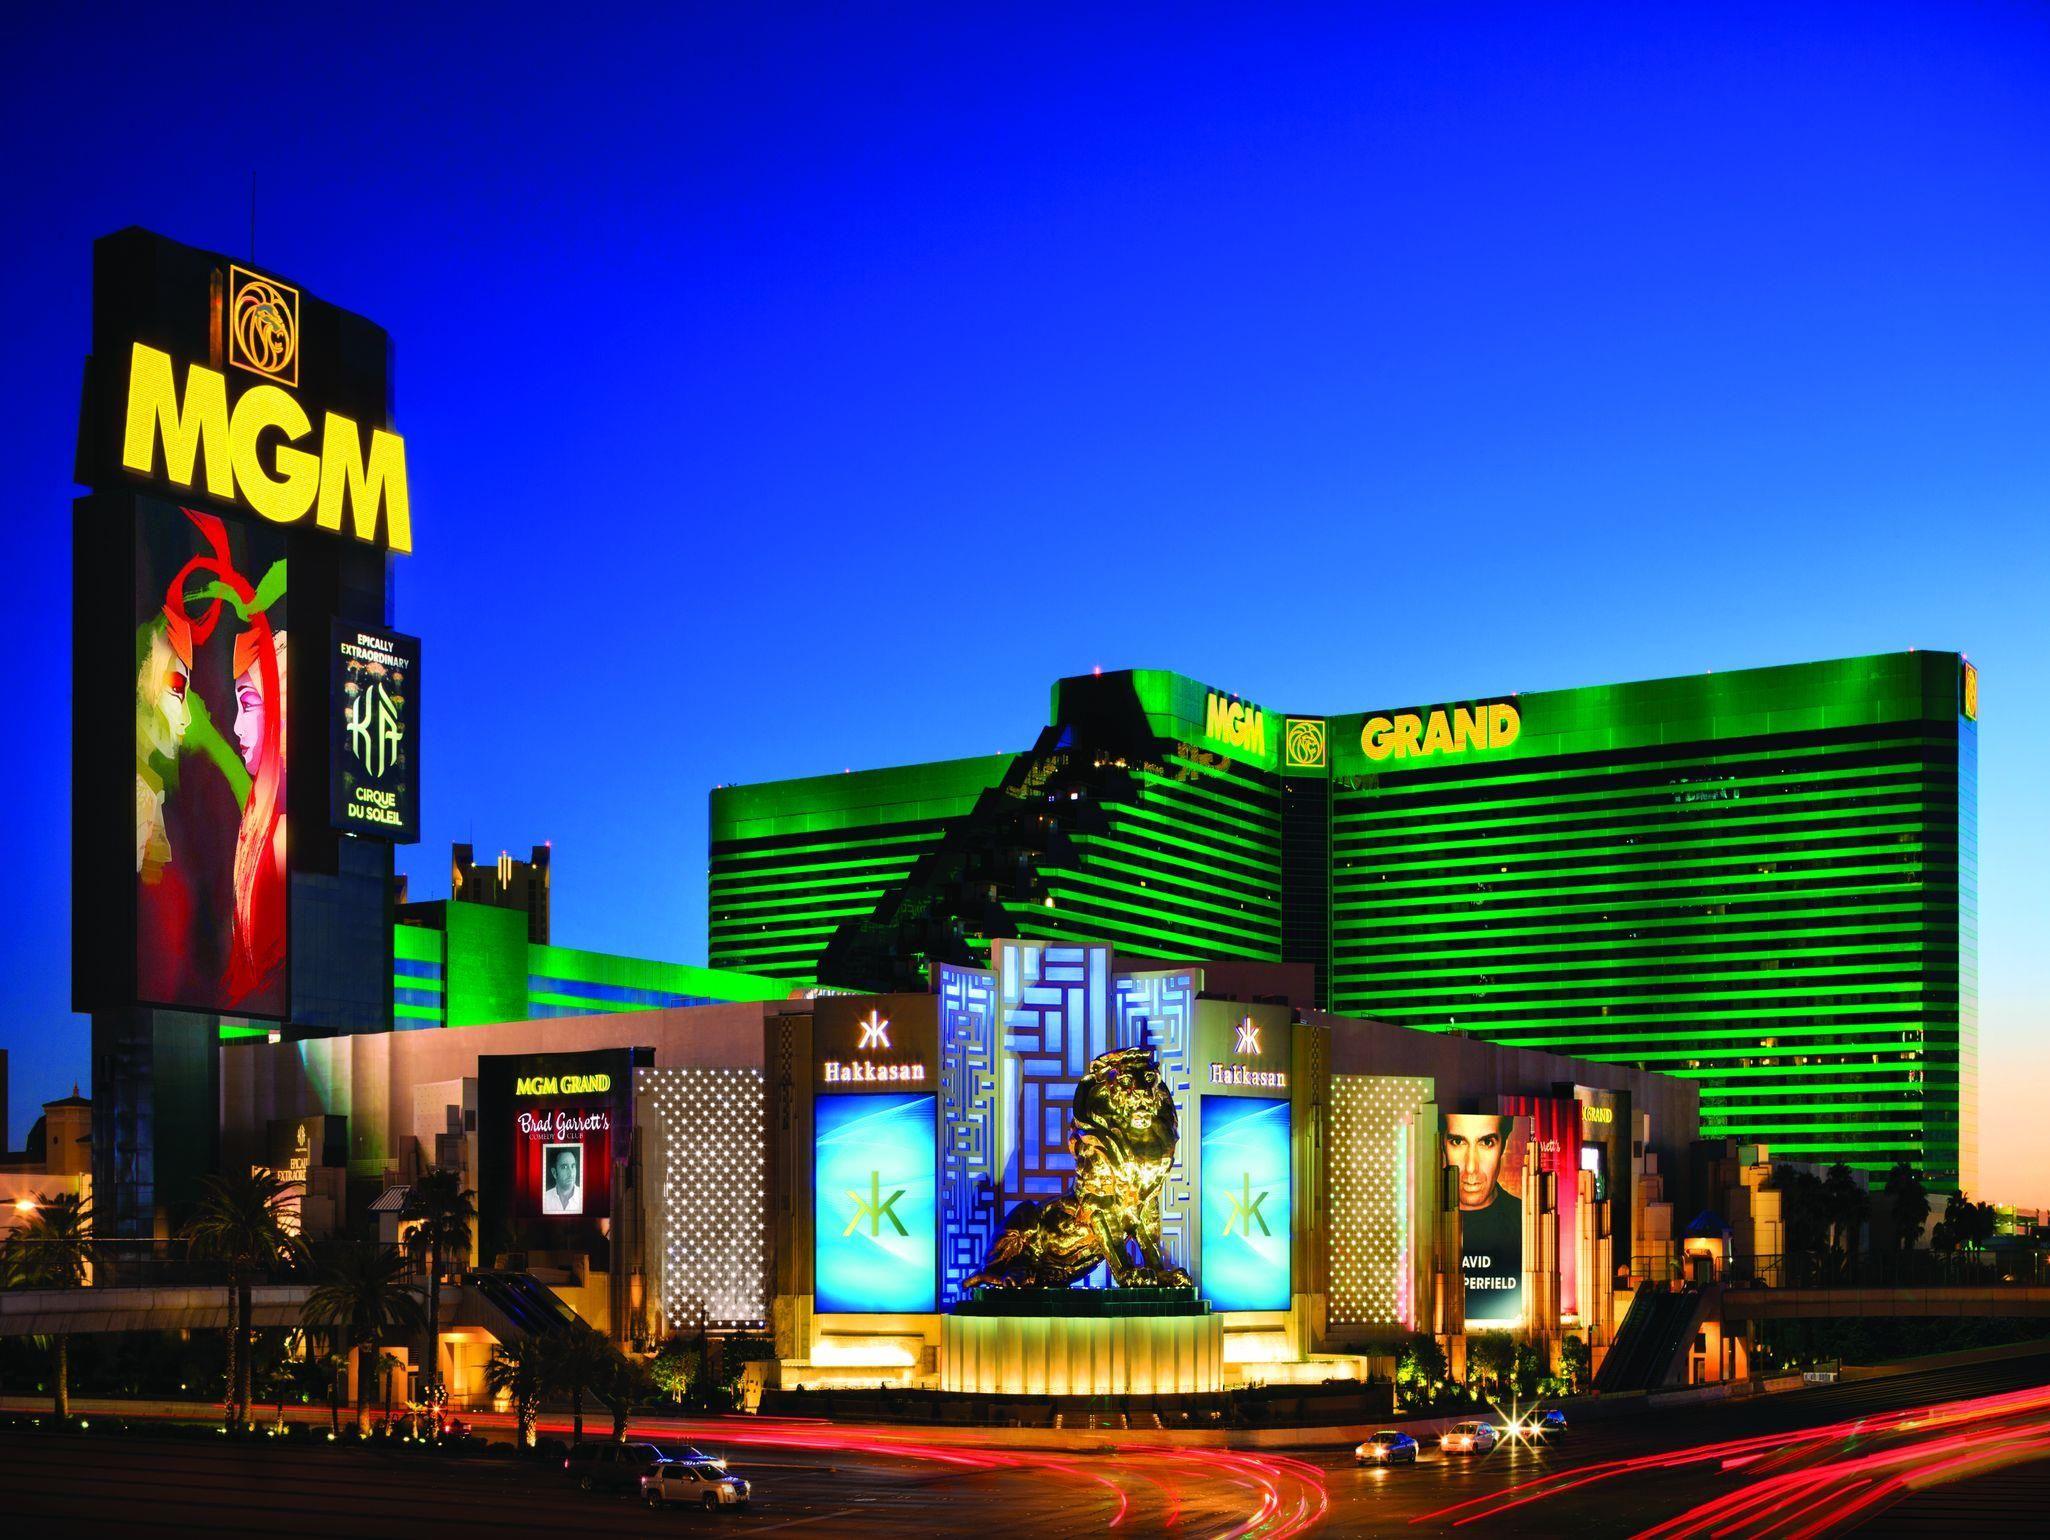 Las Vegas Nv Mgm Grand Hotel And Casino United States North